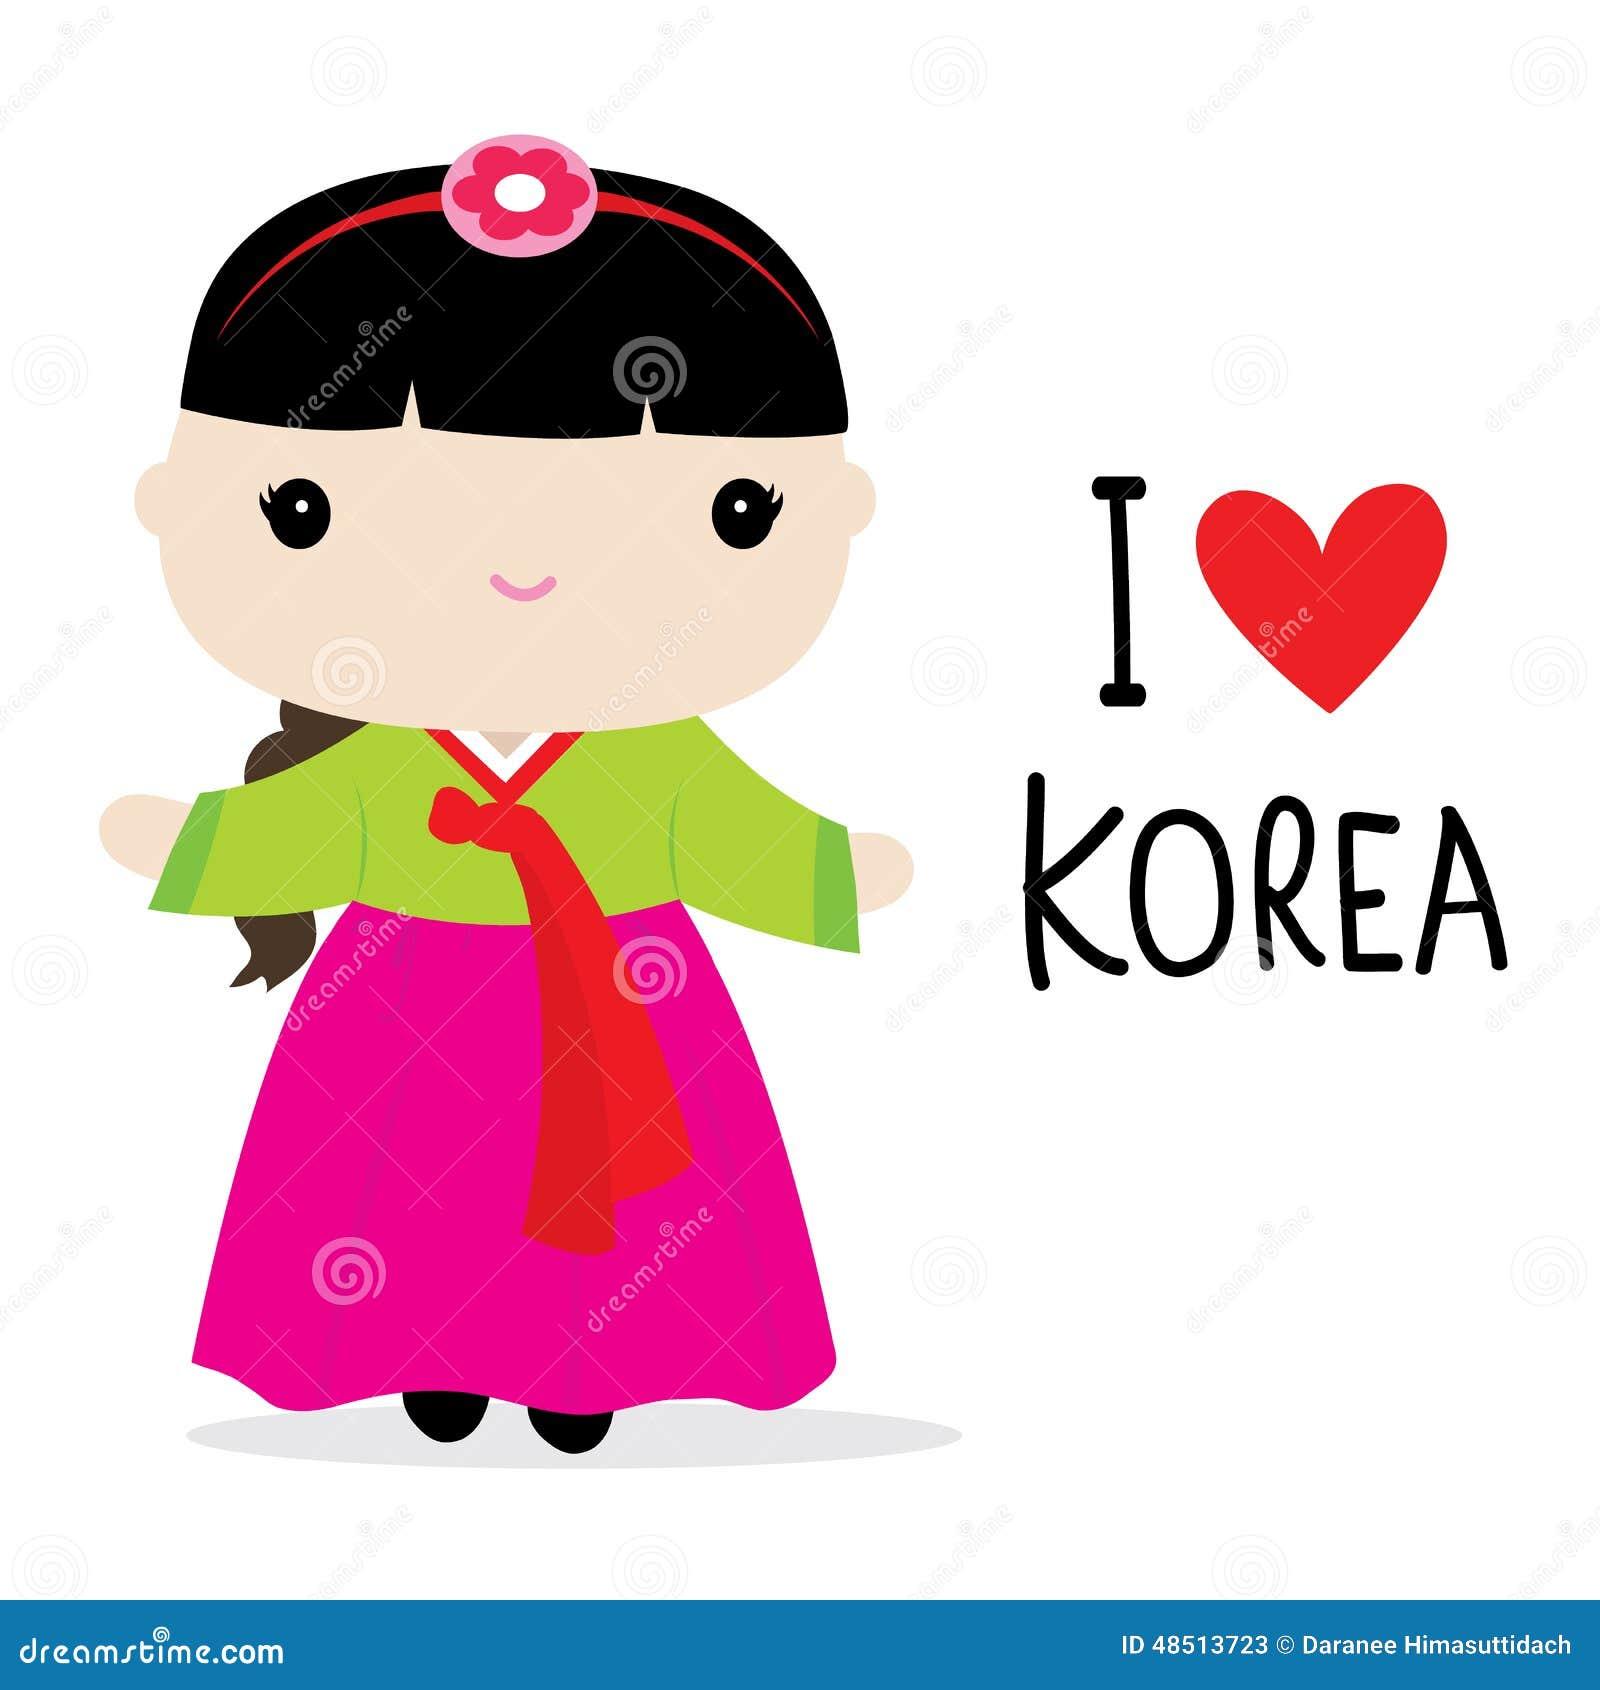 korean cartoon clipart - photo #17